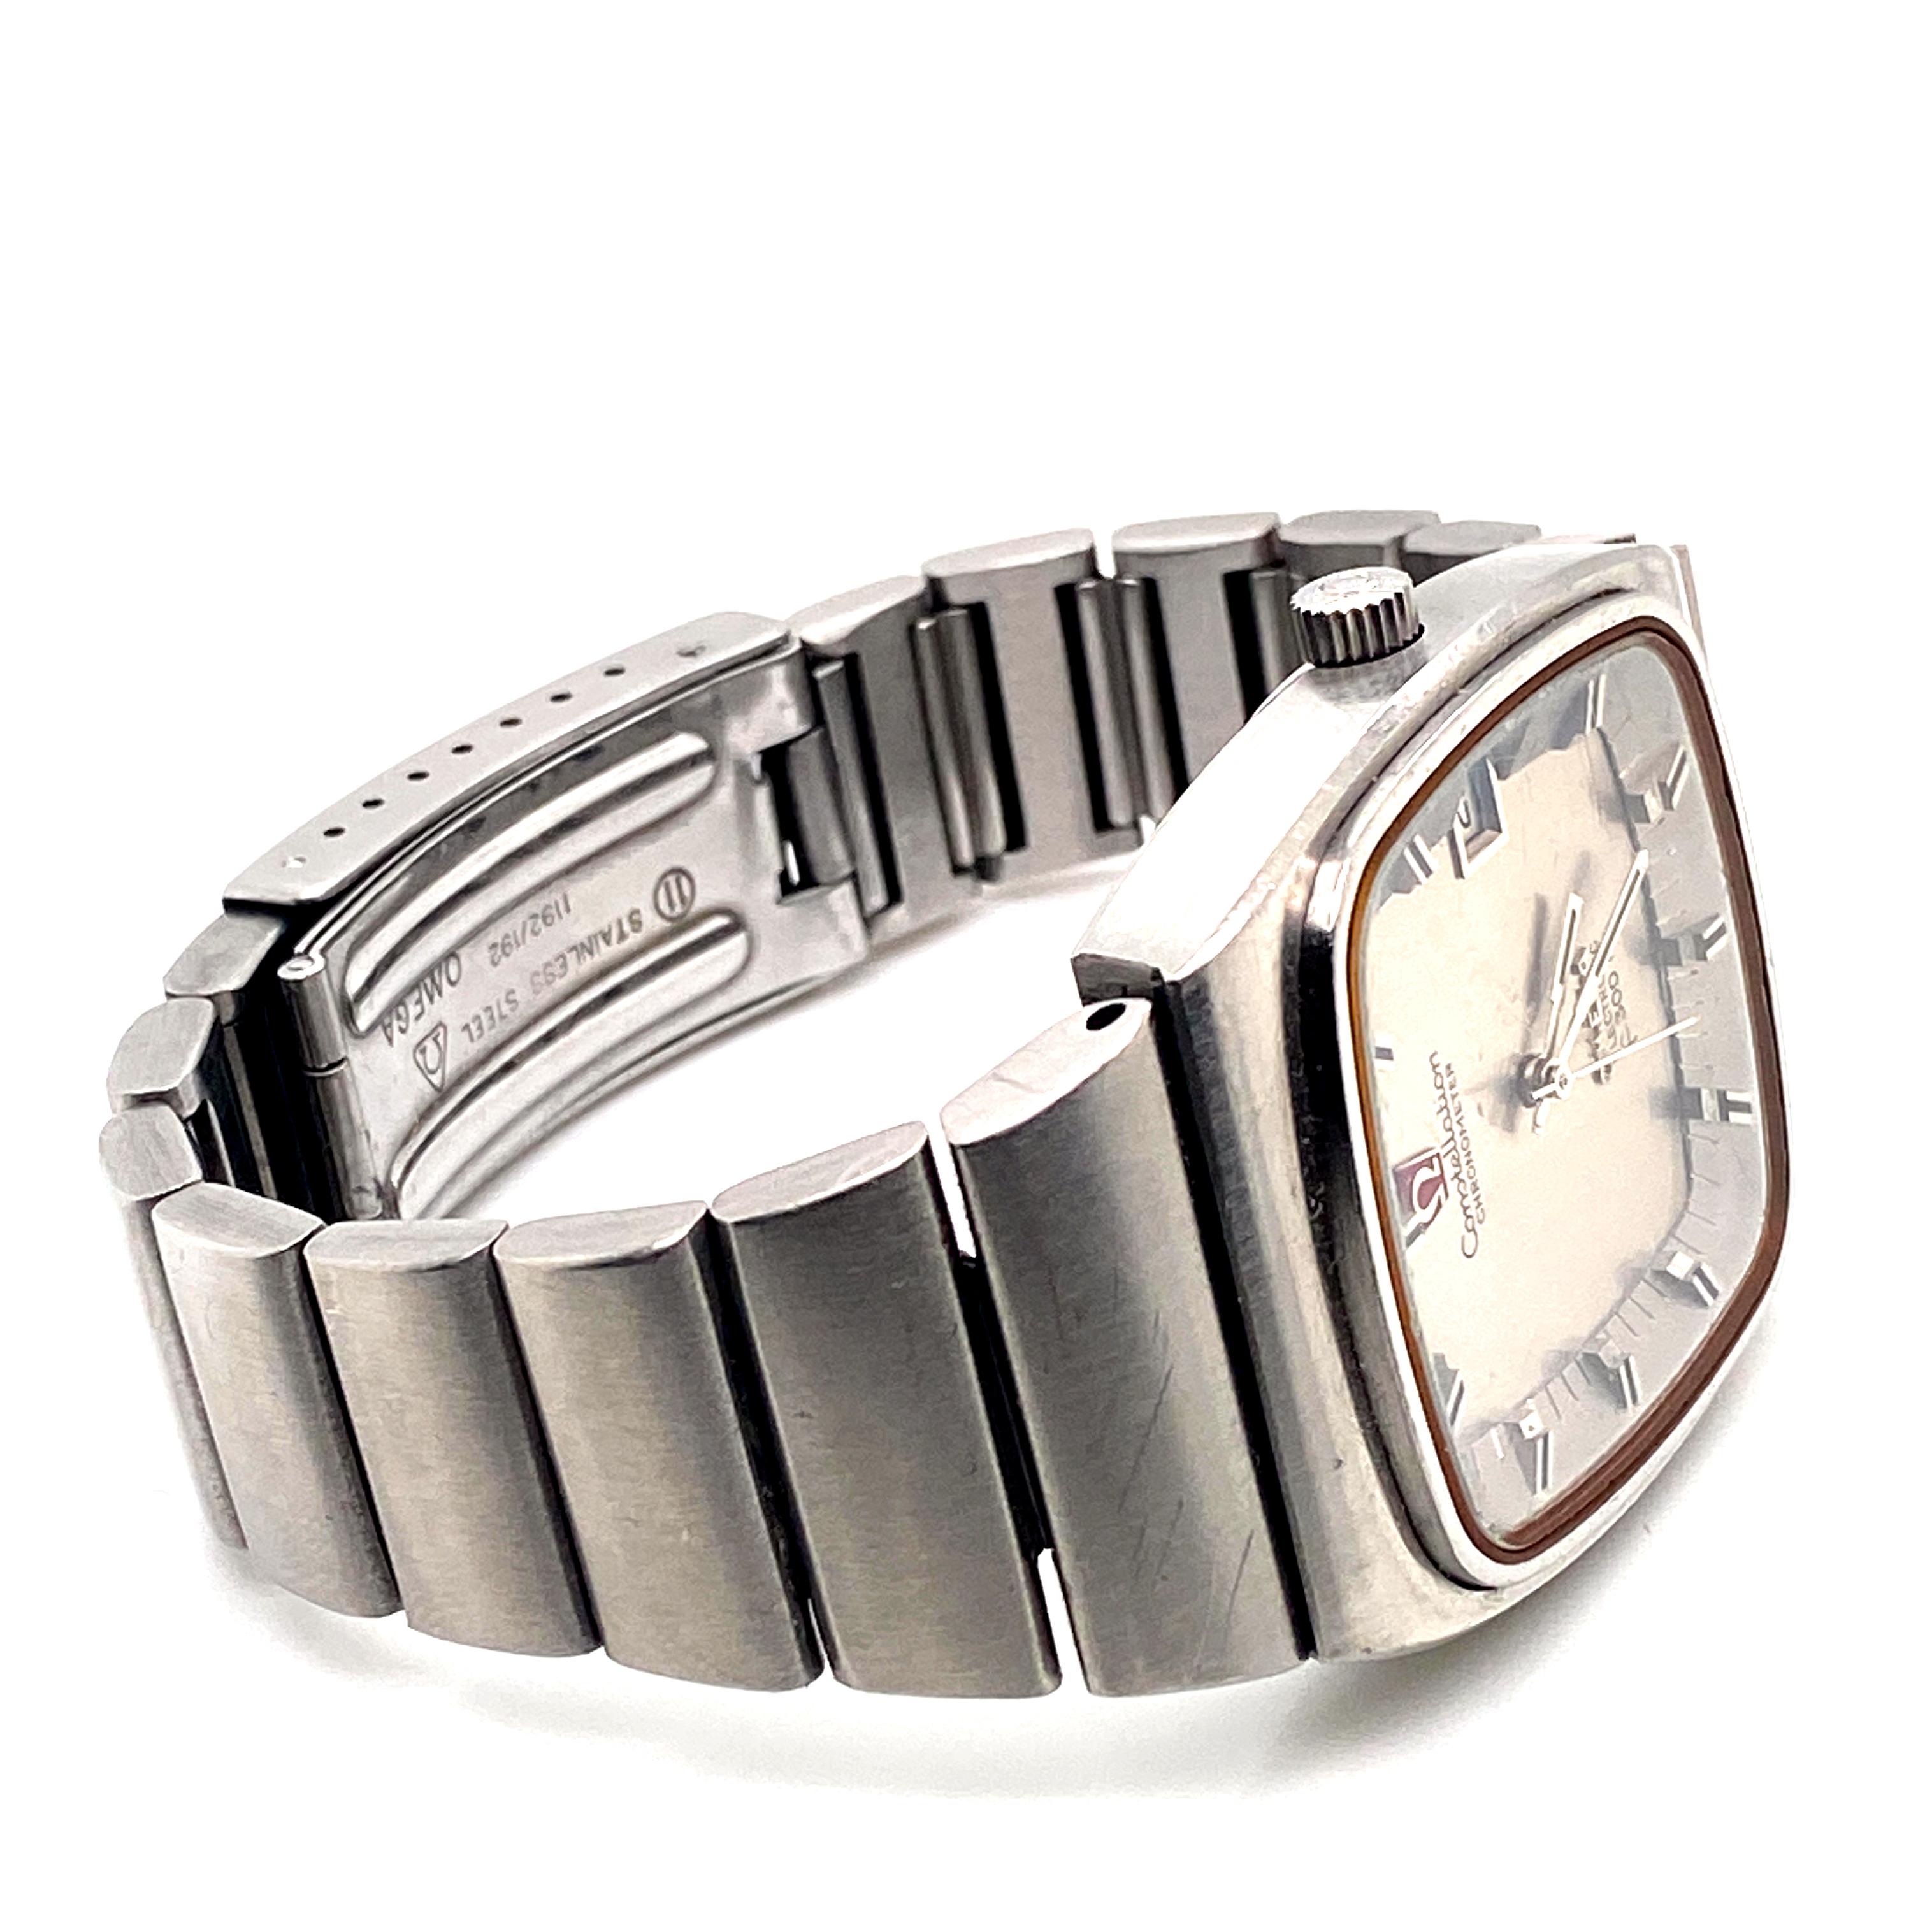 Lot 9 - Omega Constellation Chronometer f300hz ref 1980002